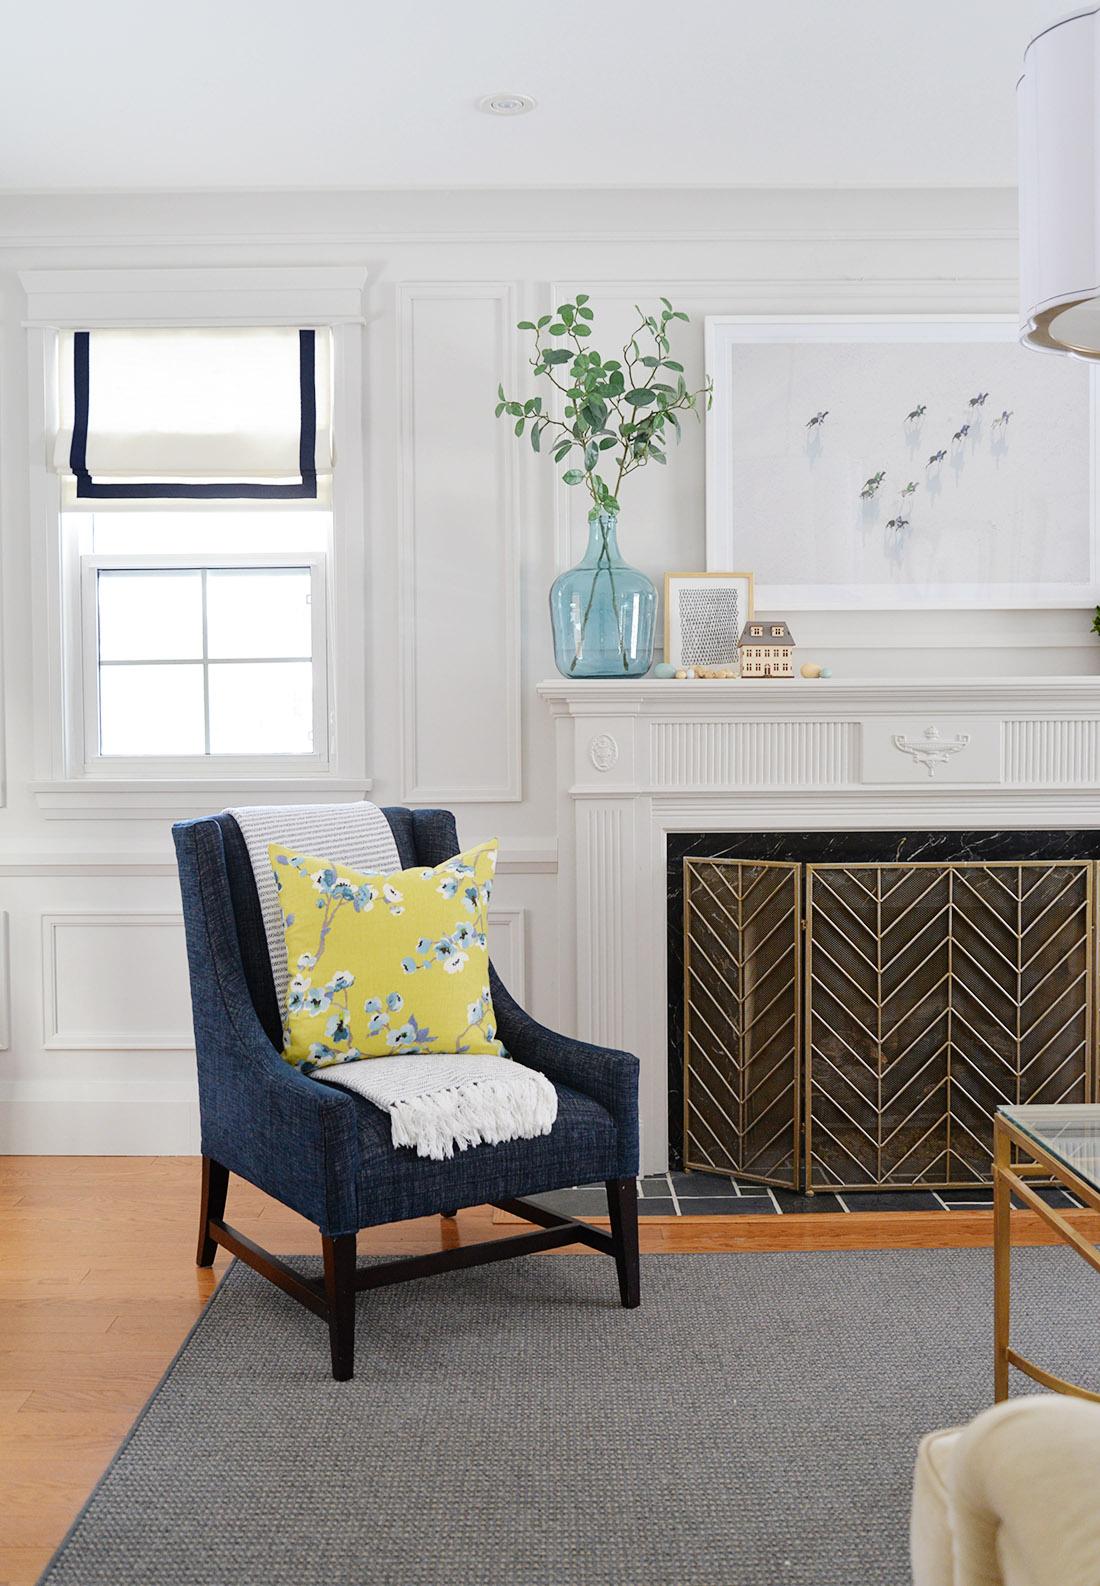 fireplace mantel decor ideas, how to decorate your fireplace mantel, fireplace greenery, spring mantel ideas